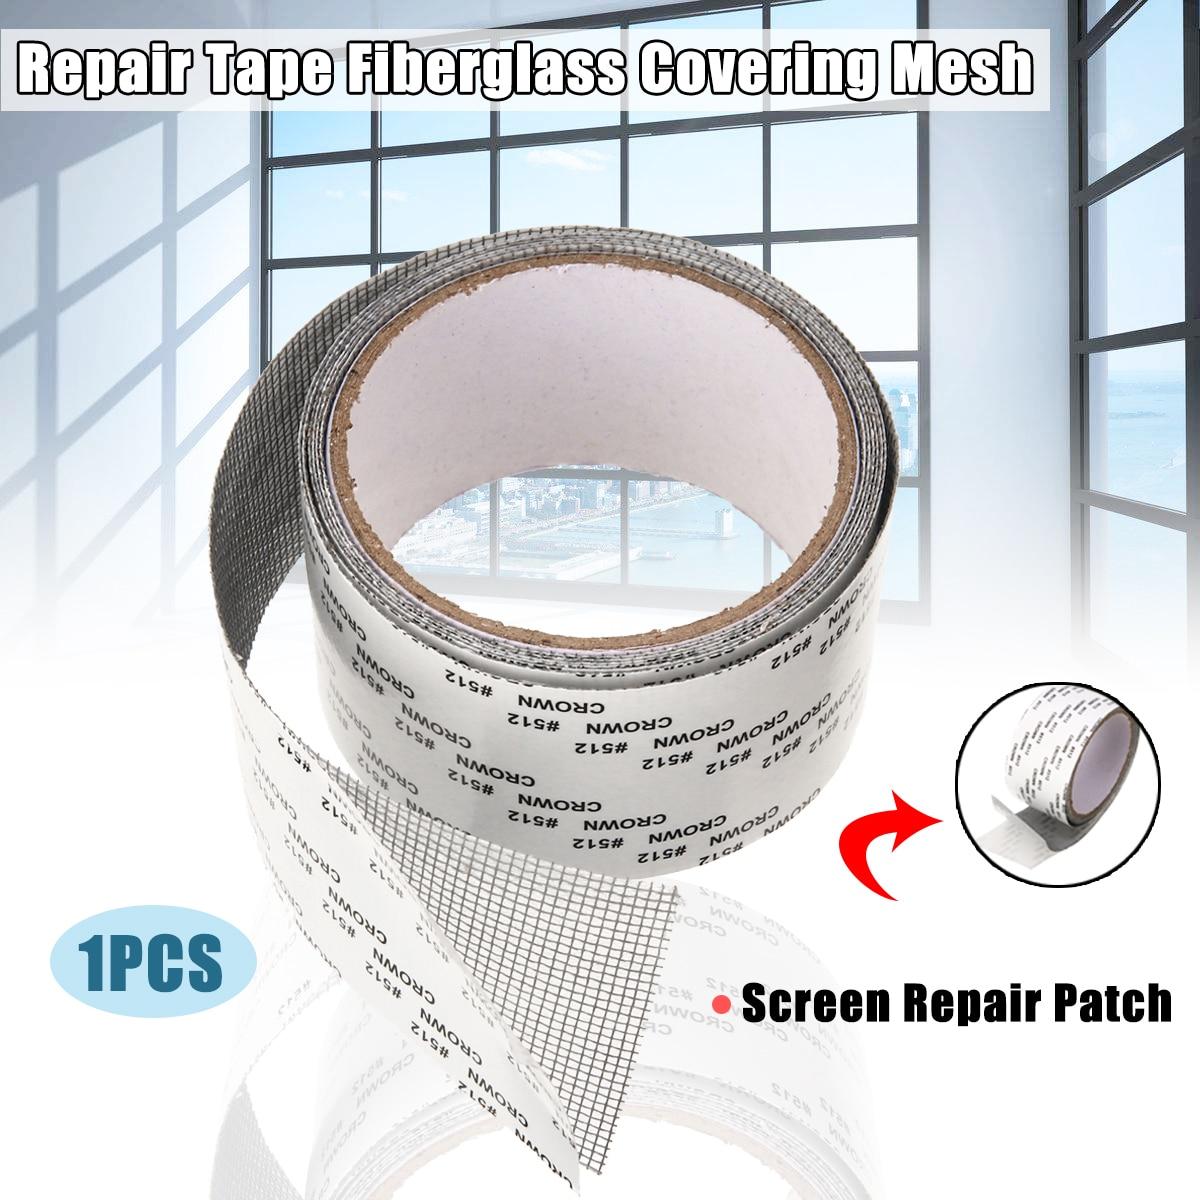 5x200cm Screen Patch Repair Kit Window Screen Repair Tape Fiberglass Covering Mesh Anti-Mosquito Mesh Sticky Wires Patch